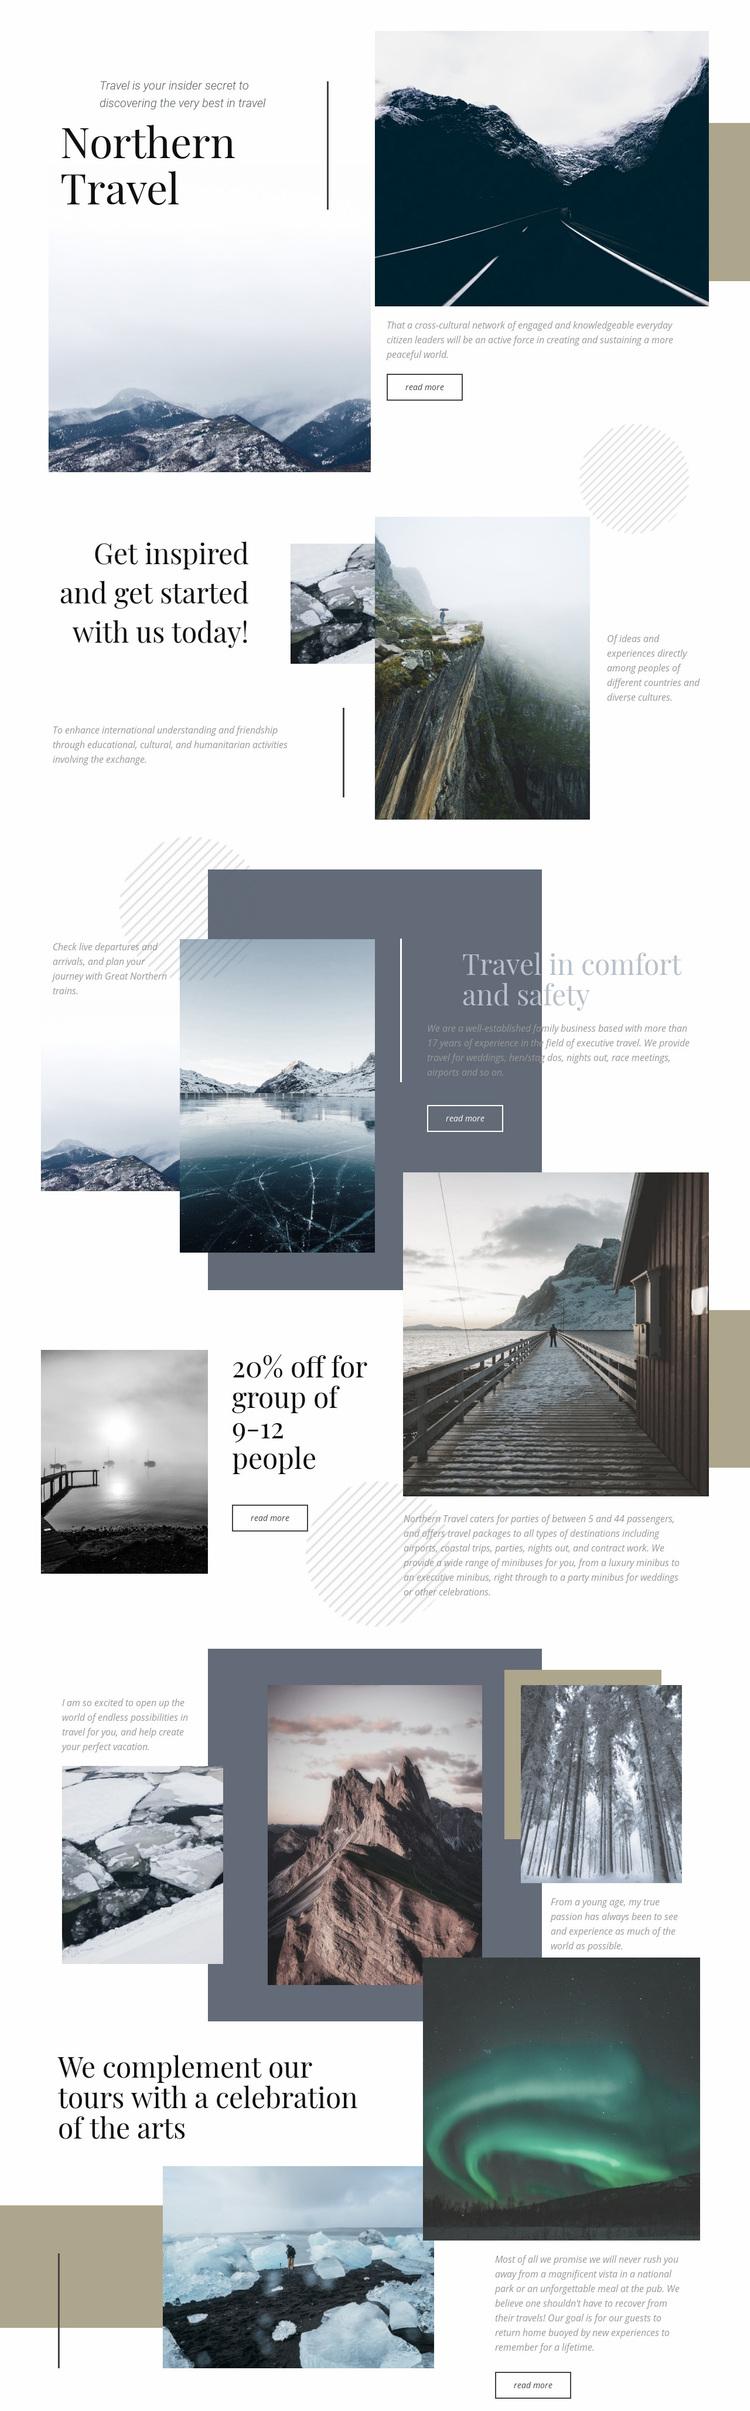 Northern Travel Web Page Designer